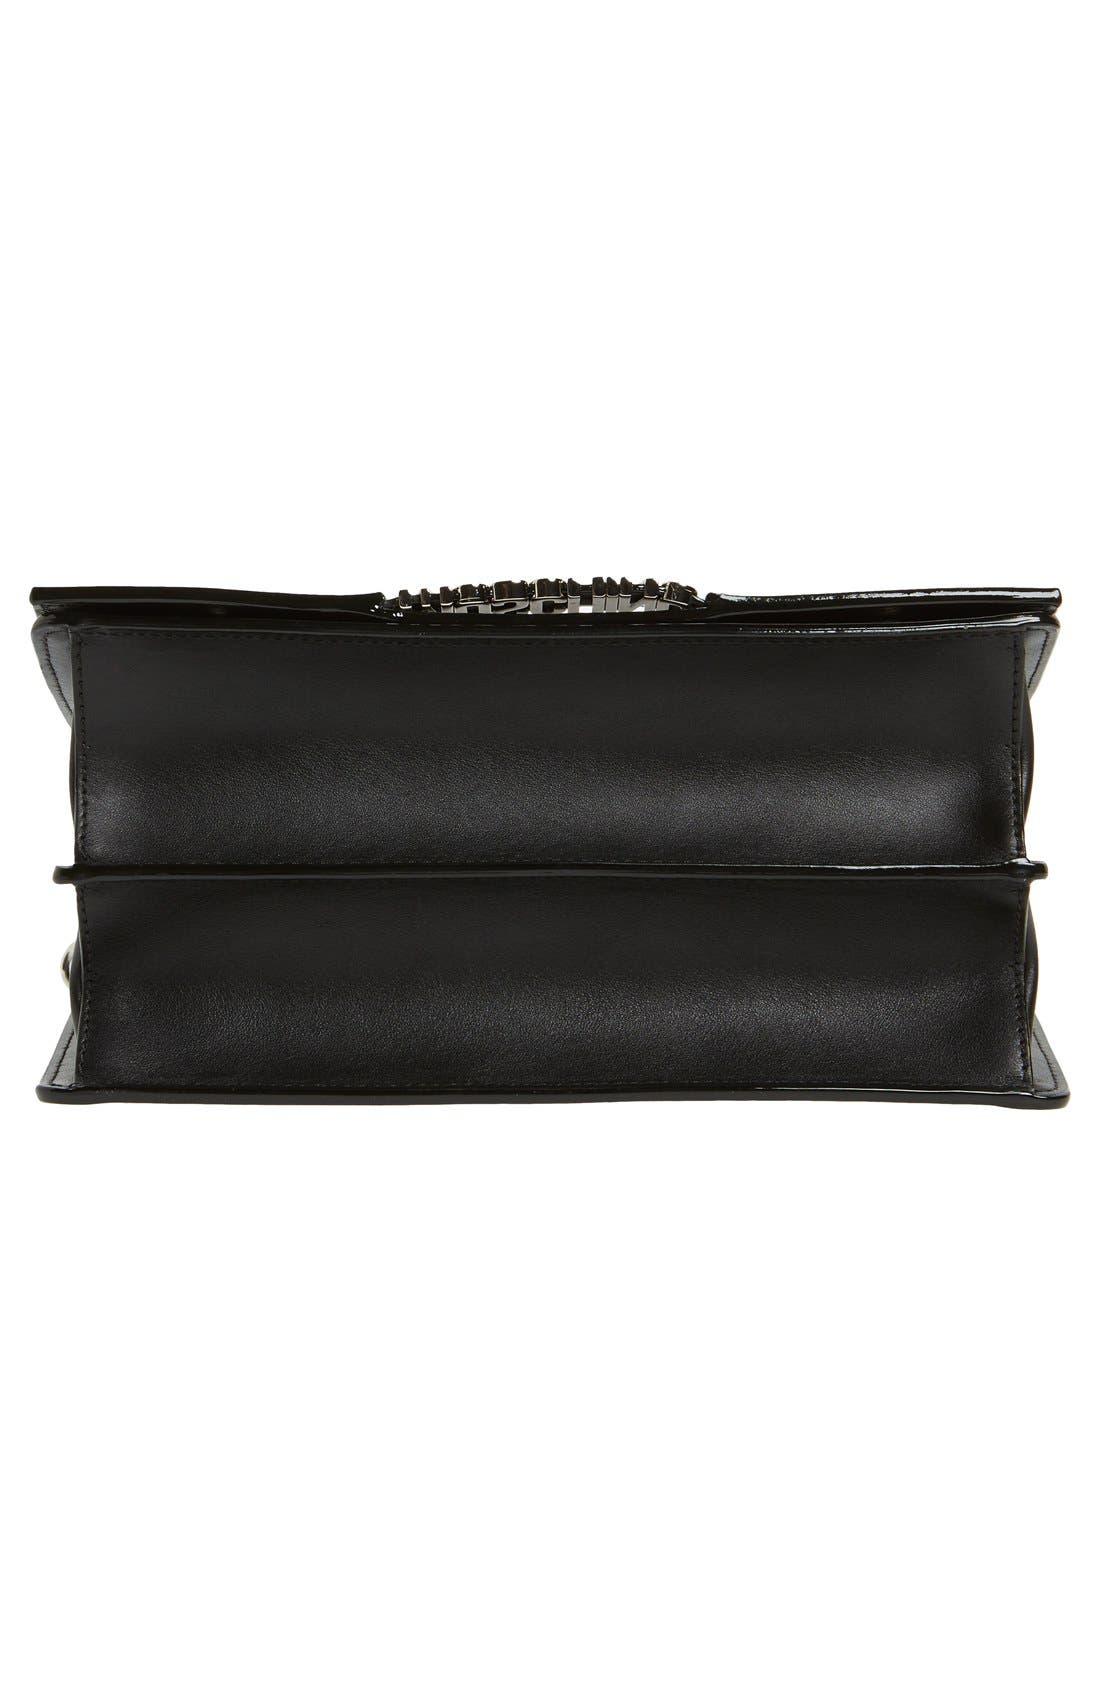 Top Handle Leather Crossbody Bag,                             Alternate thumbnail 6, color,                             001